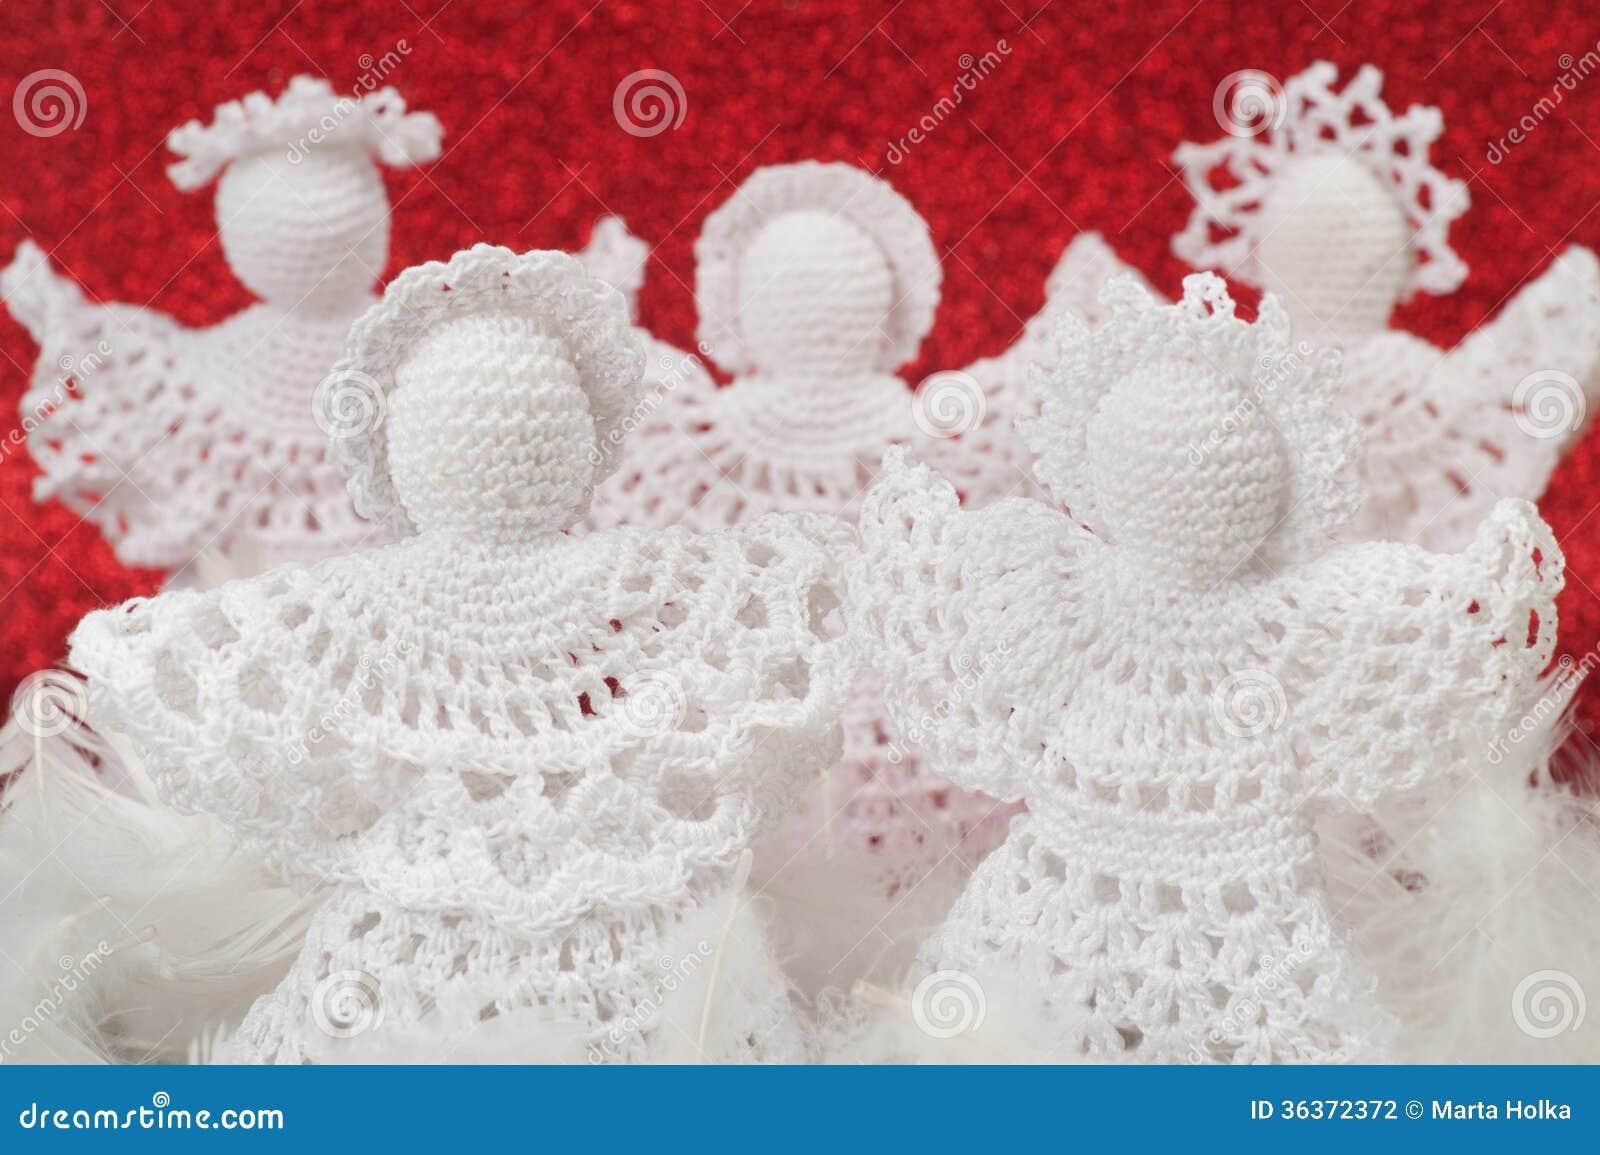 #971922 Christmas Crochet Angels Stock Photography Image: 36372372 5325 decorations de noel au crochet 1300x955 px @ aertt.com